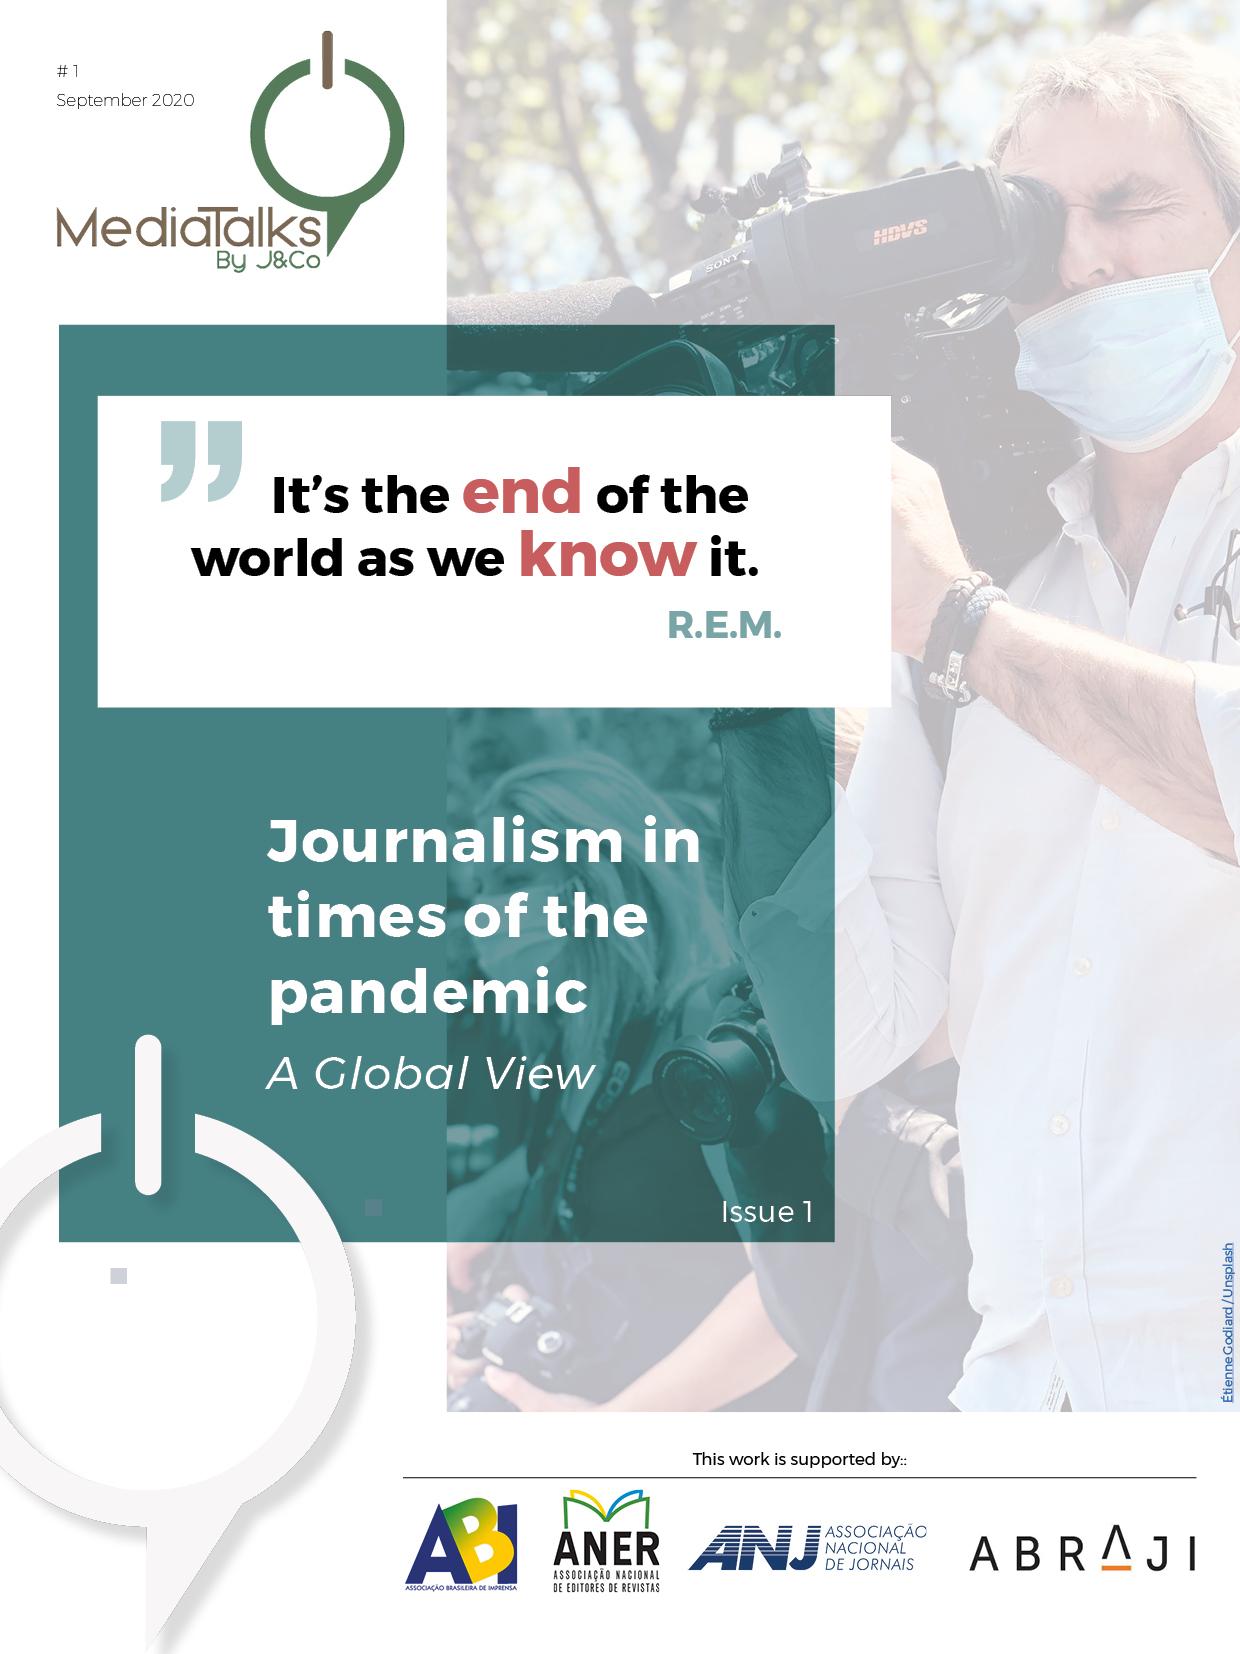 mediatalks2020dingles